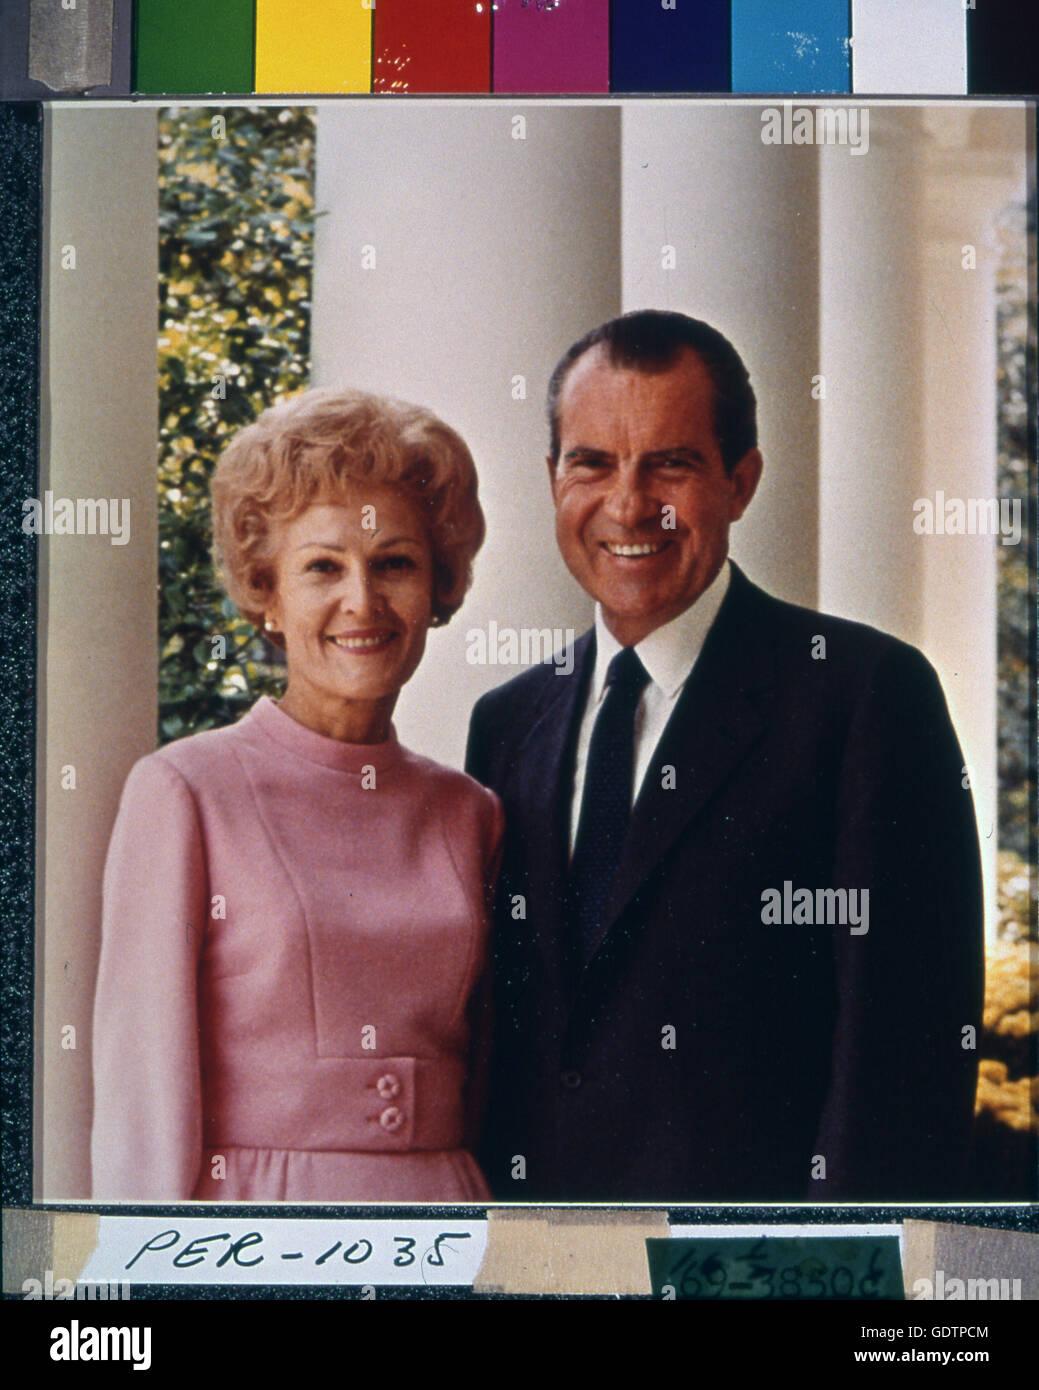 Informal portrait of President Richard M. Nixon and First Lady Pat Nixon. Stock Photo